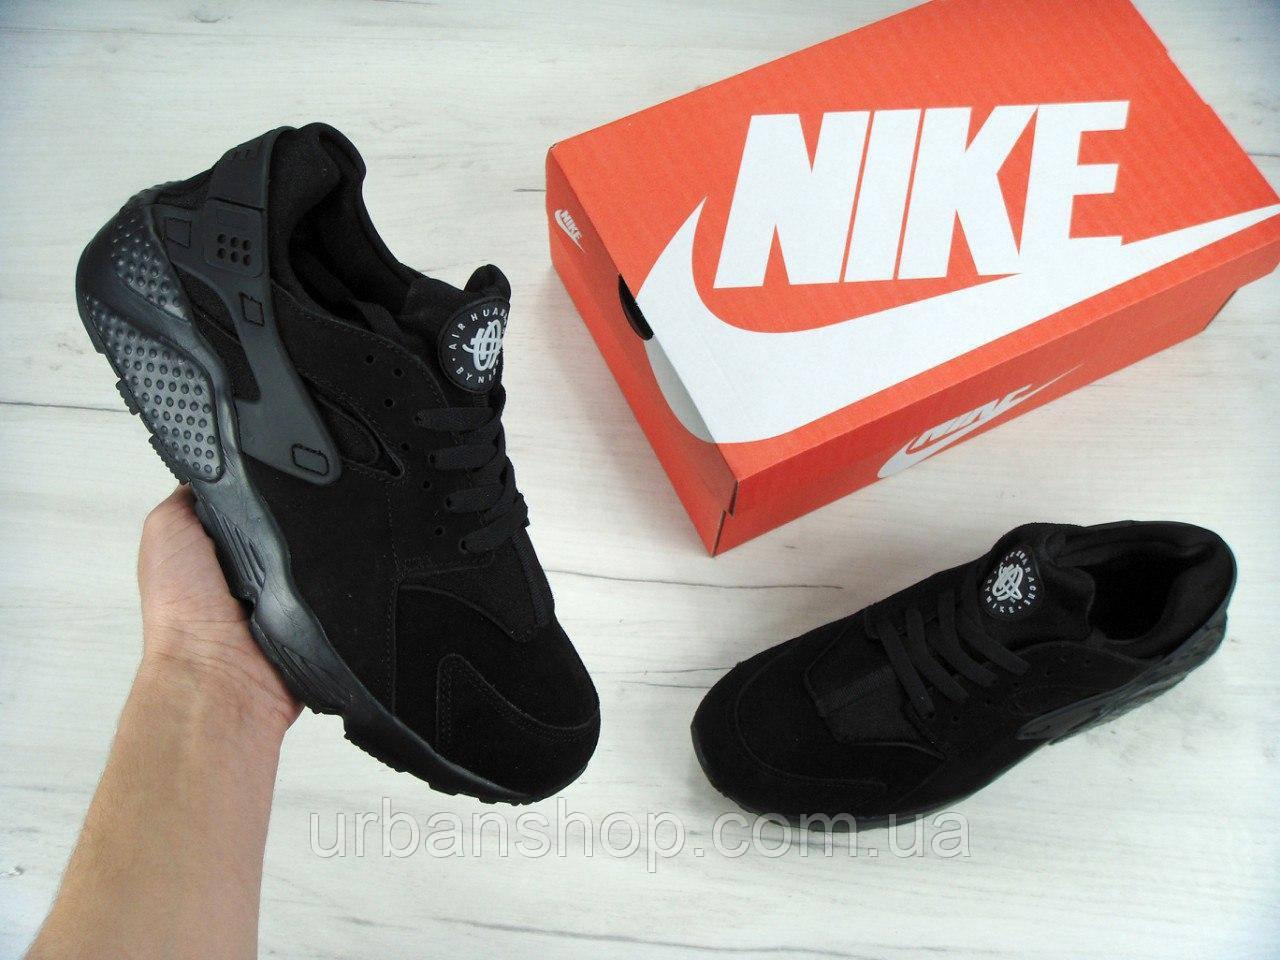 Зимние мужские кроссовки Nike Air Huarache All Black Winter Edition, найк, айр хуараче